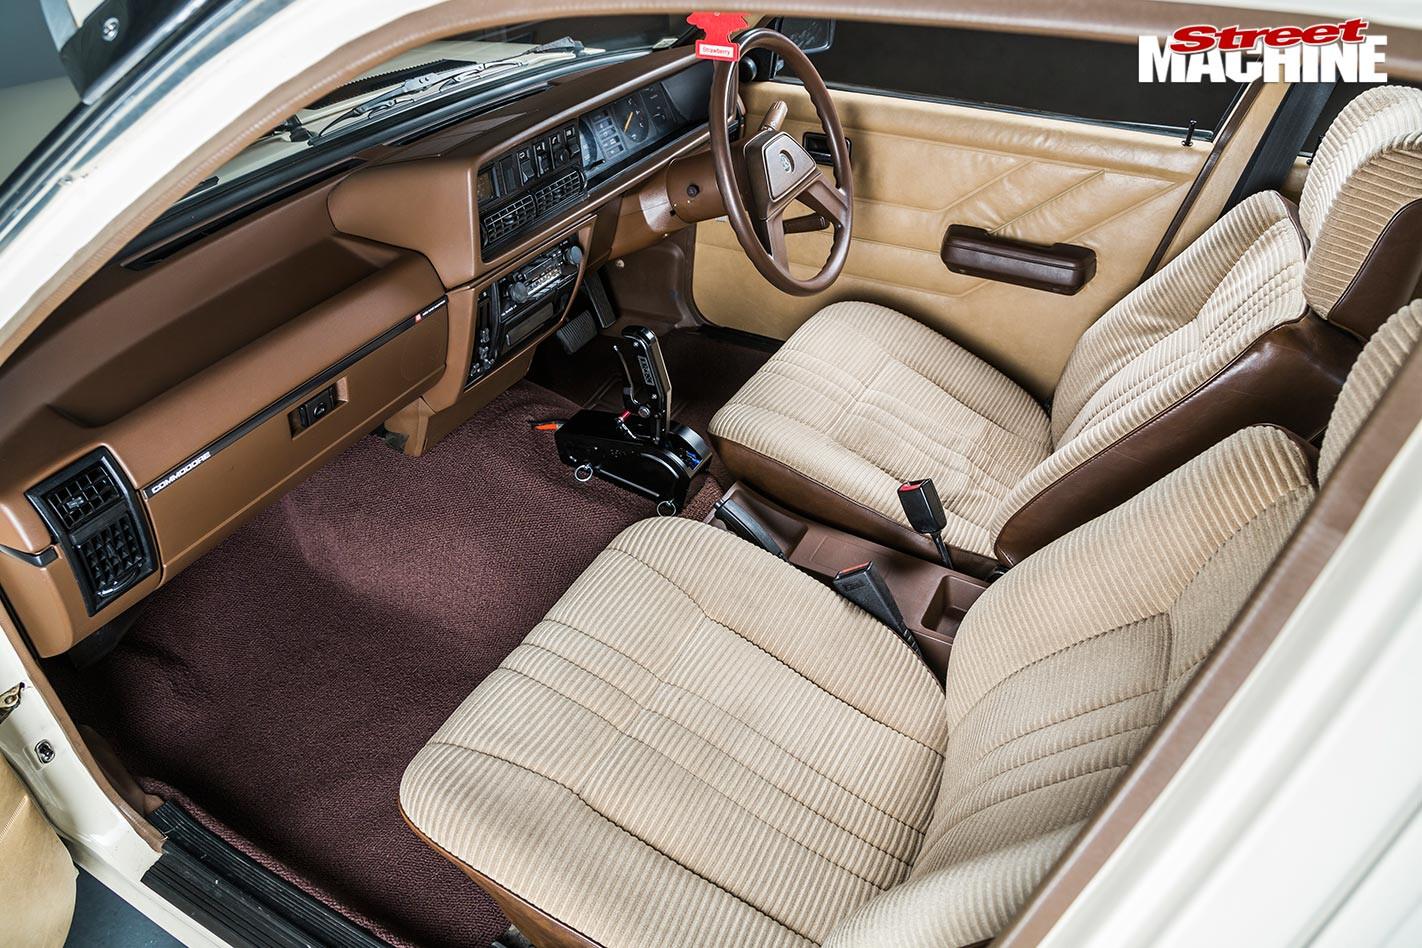 Holden Commodore interior front